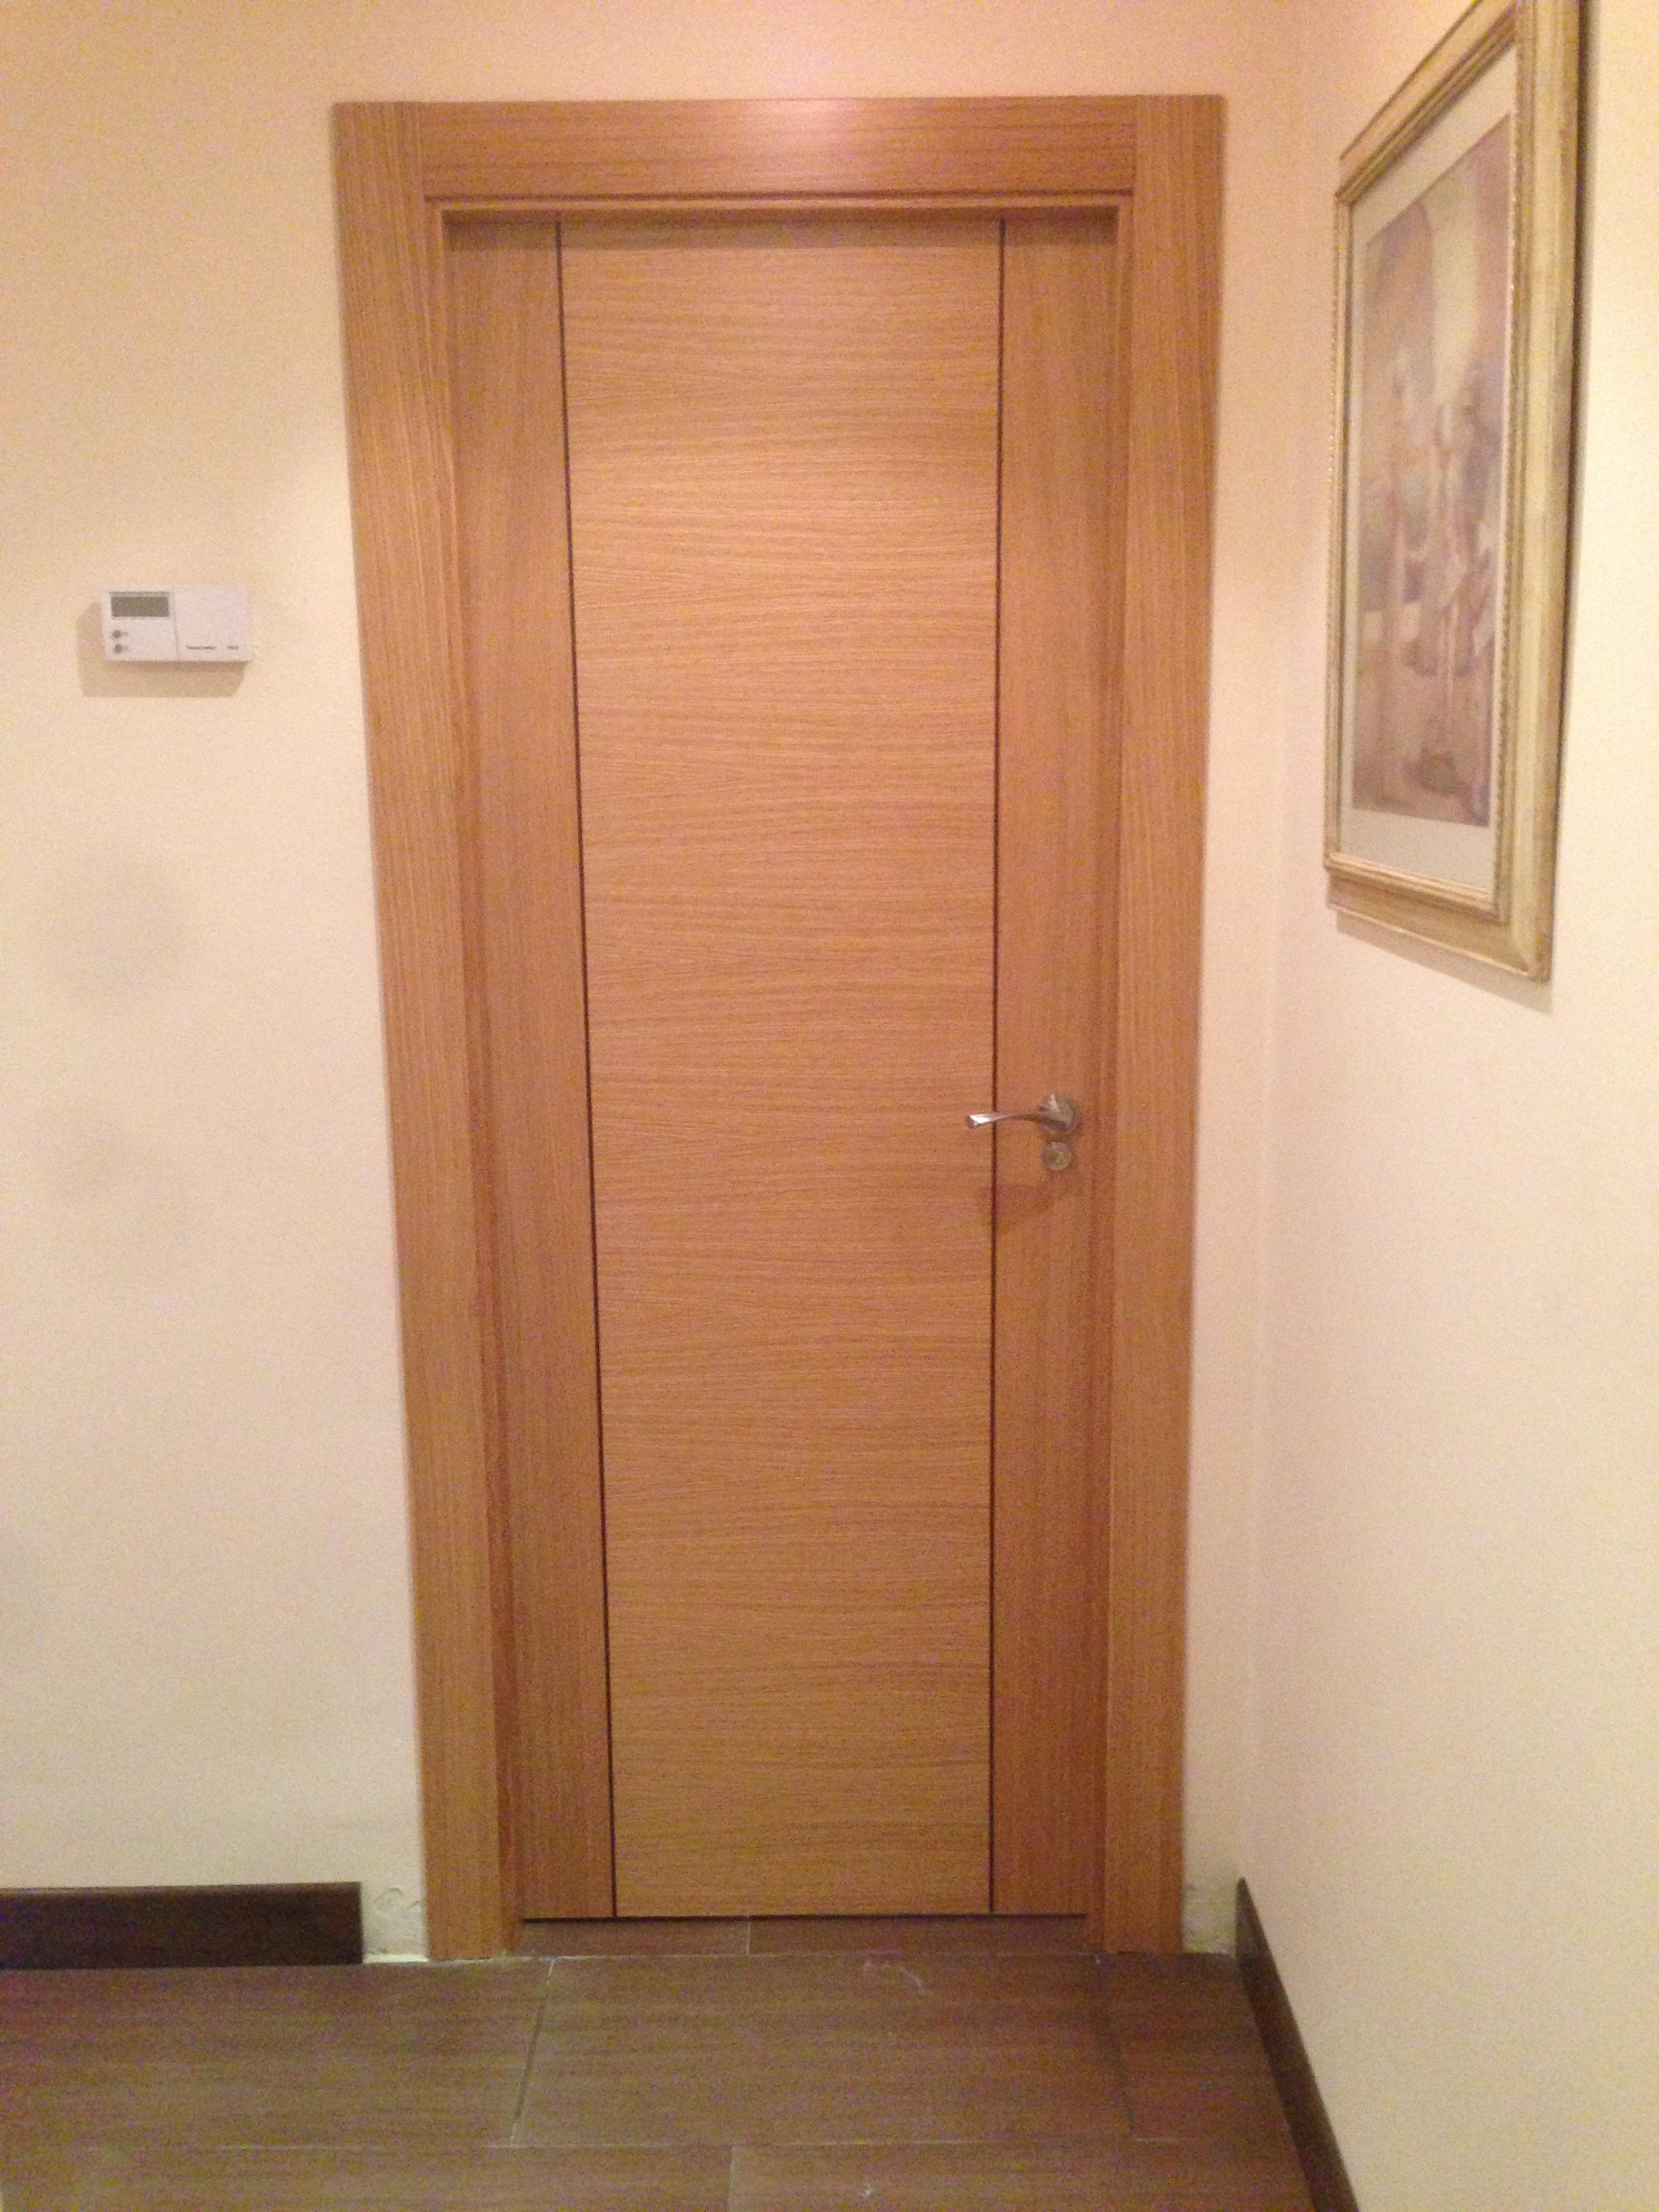 Puertas interior roble modernas greca oscura puertas - Puertas de roble ...